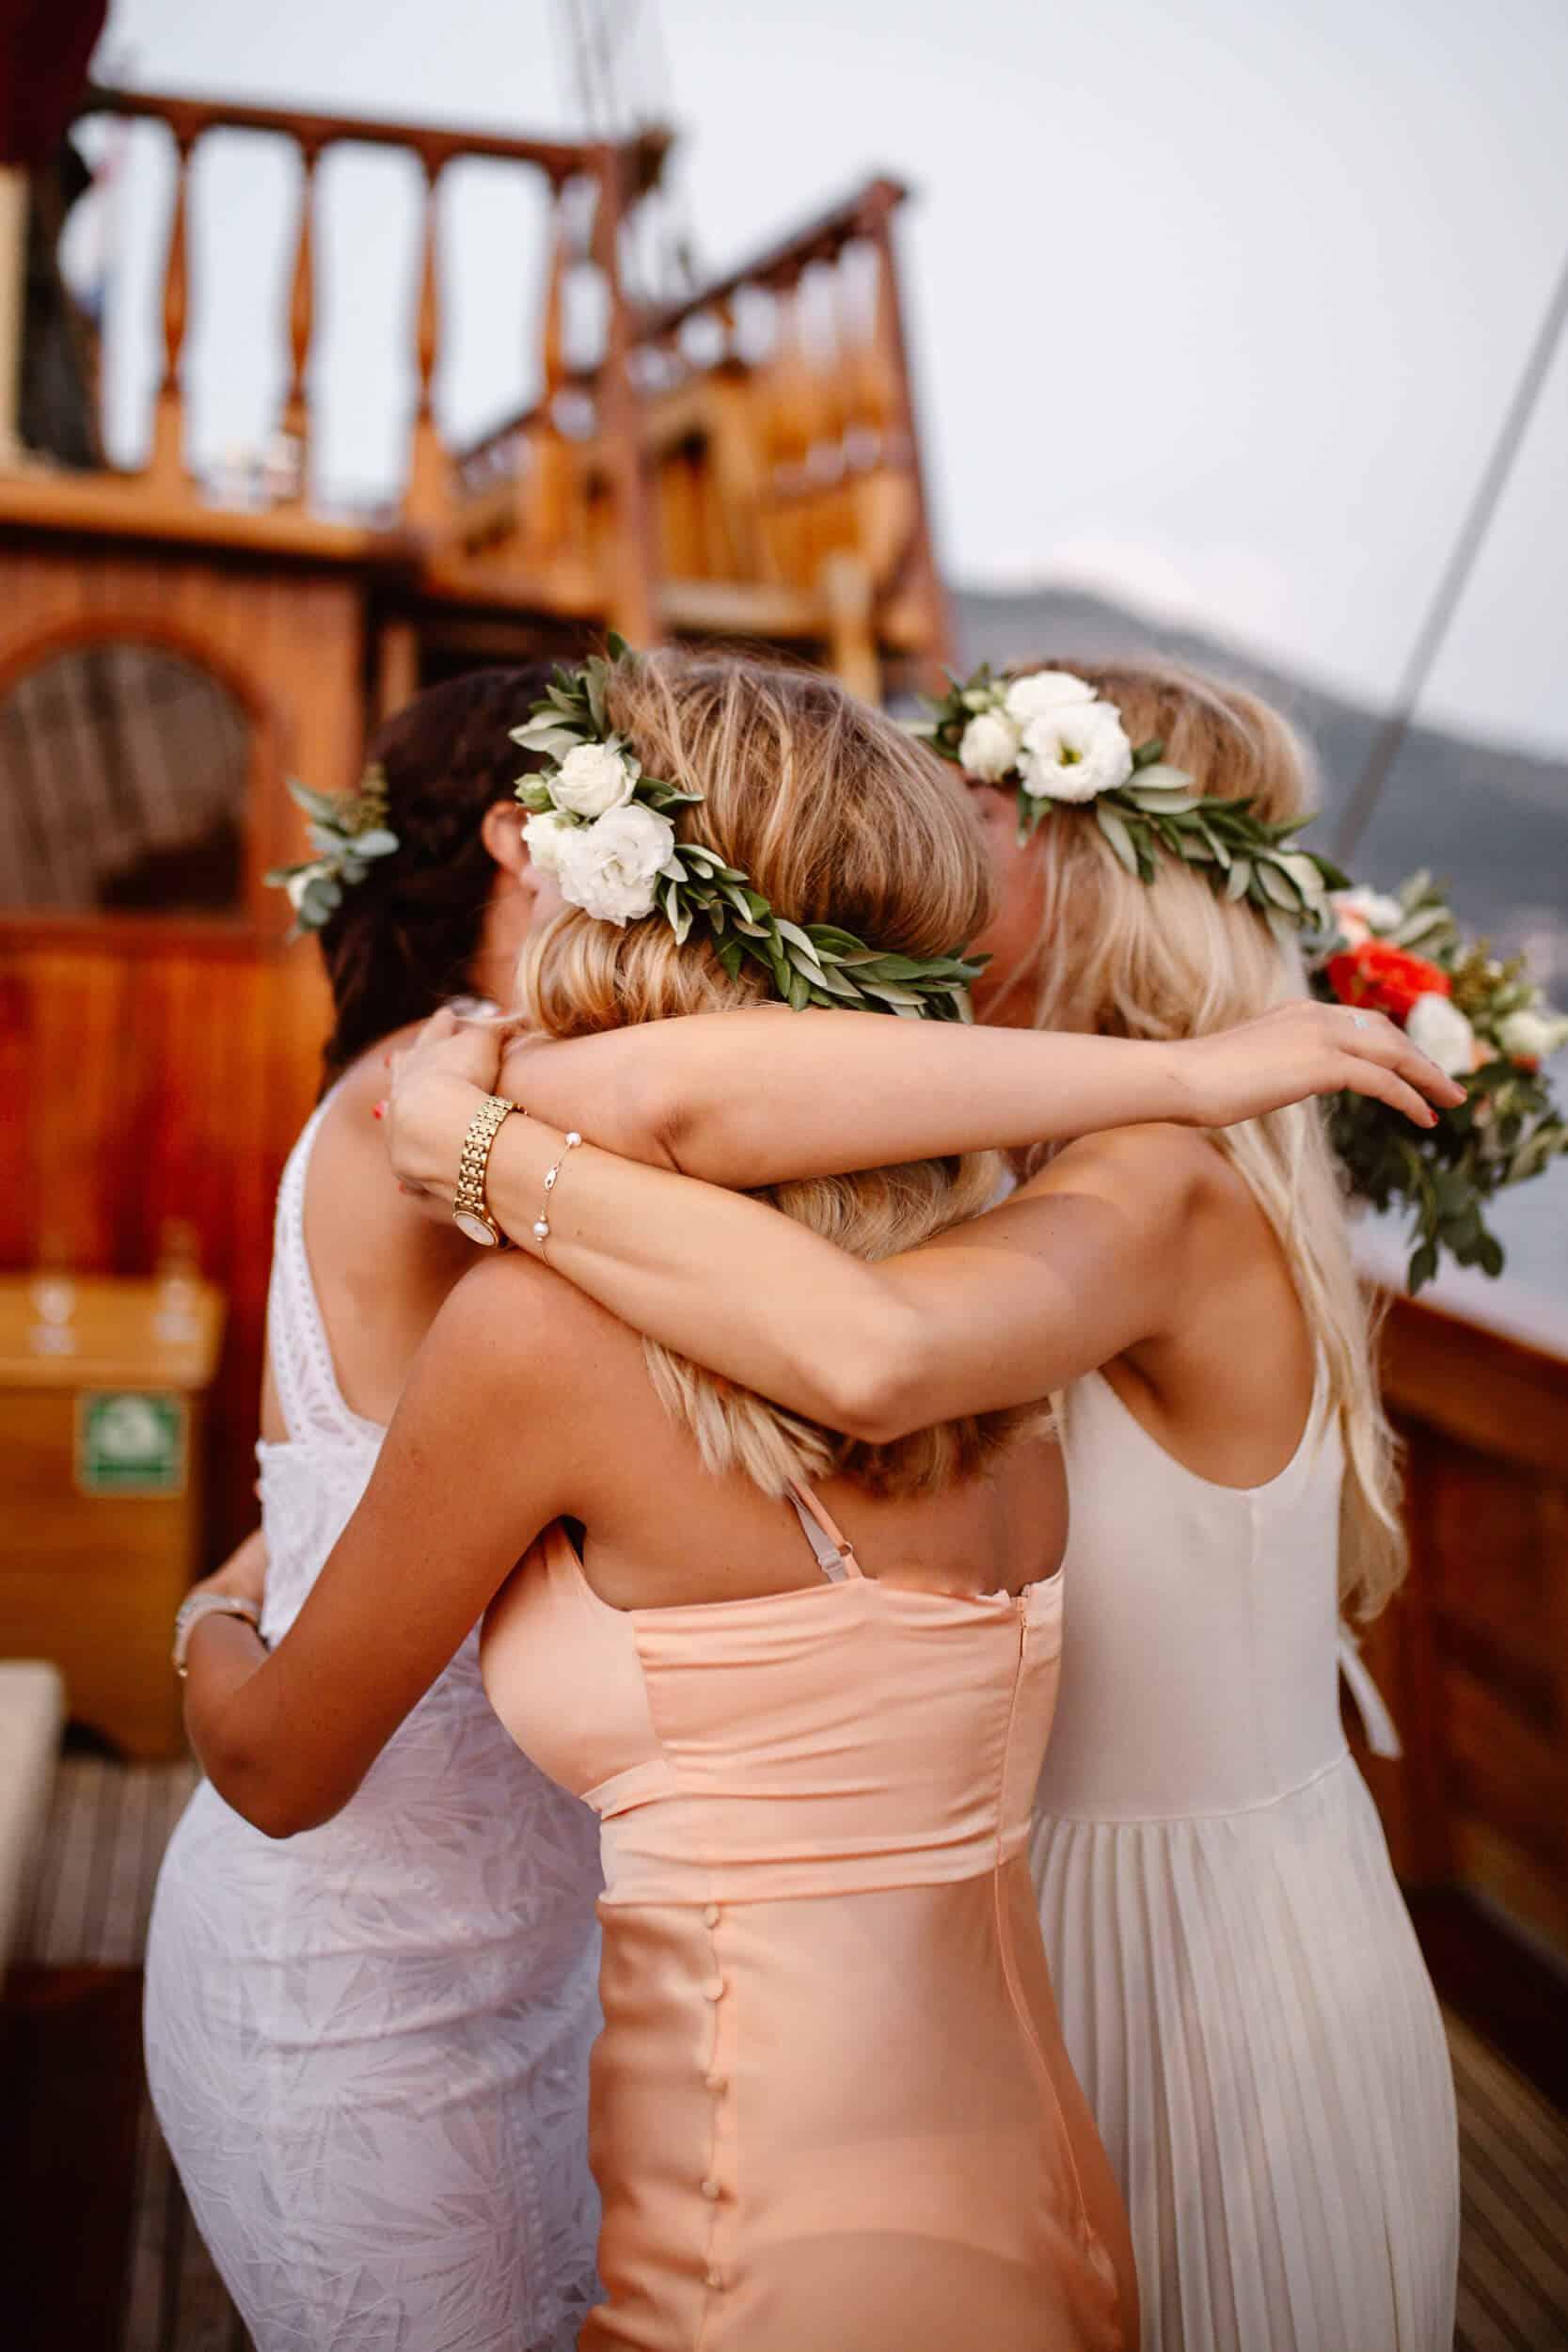 Dubrovnik karaka boat elopement matea stephan 22 | Croatia Elopement Photographer and Videographer